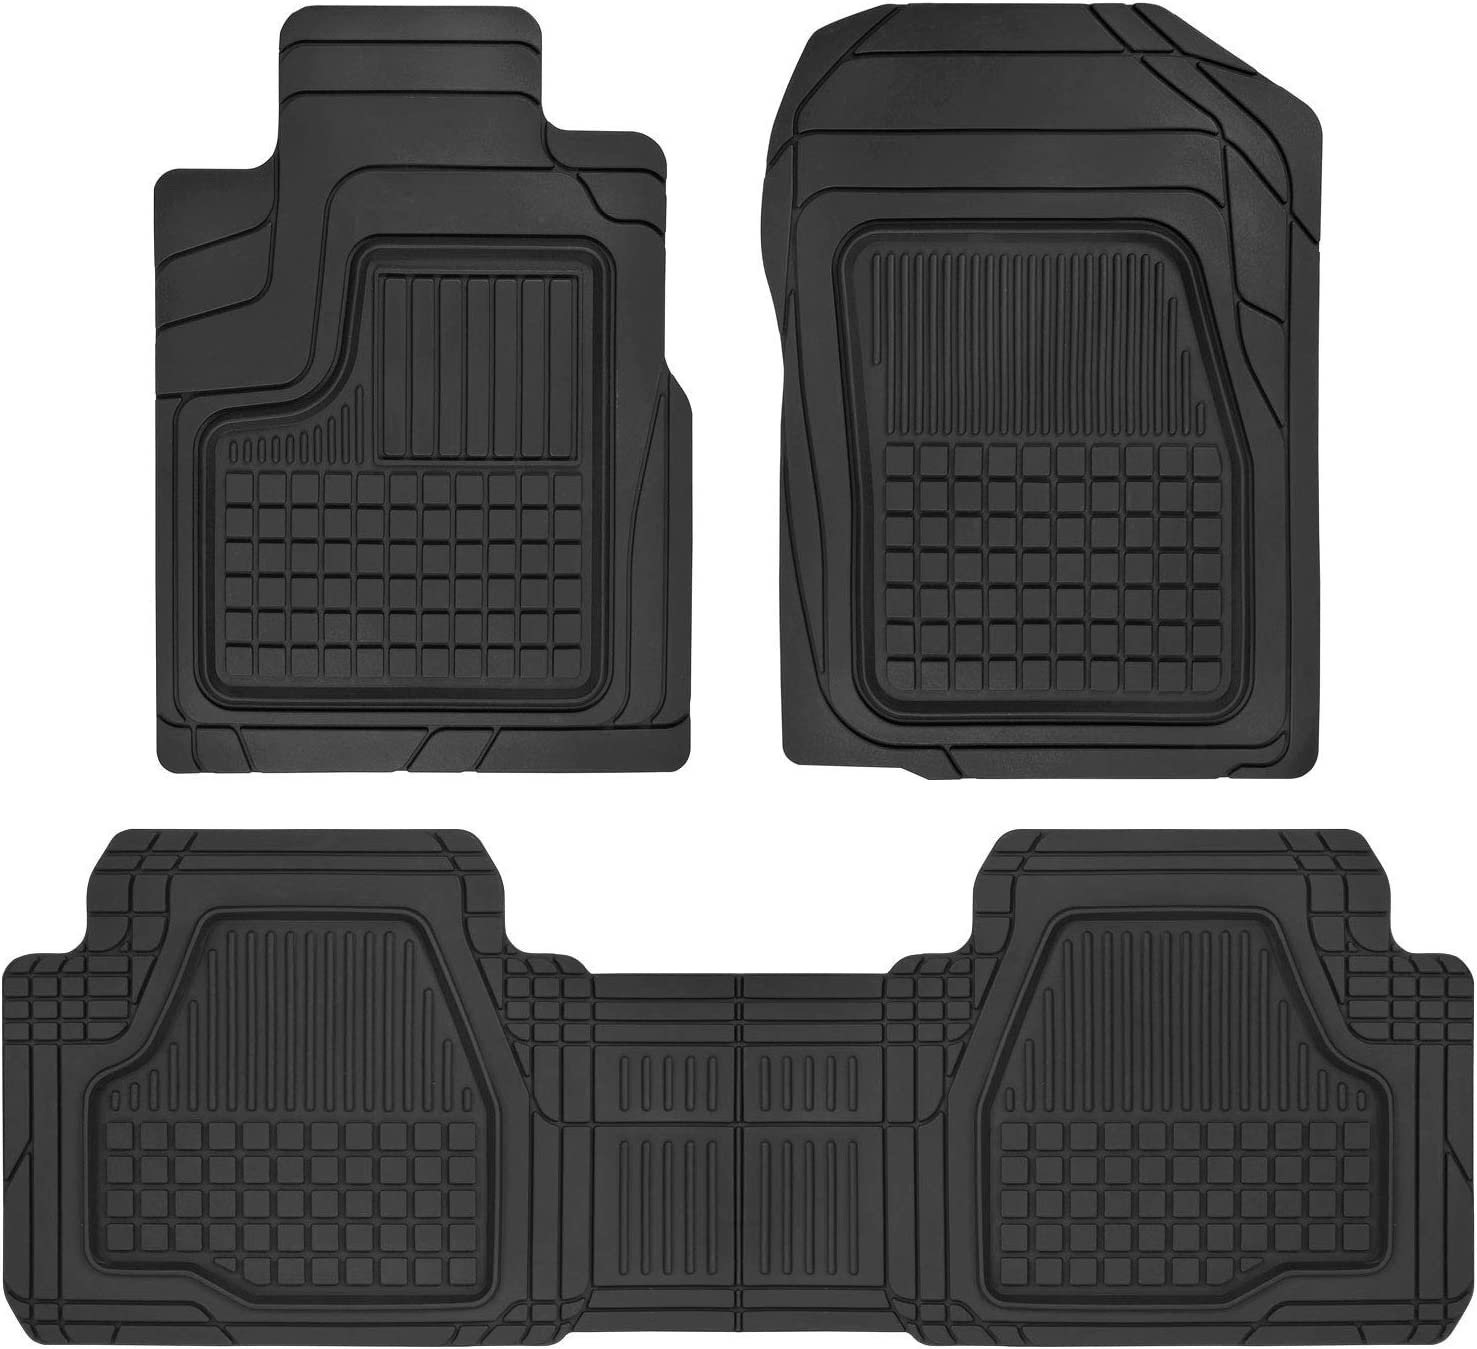 Custom Fit Premium Trim, All Weather Deep Dish Car Floor Mats for Ford Escape, Honda CR-V, Toyota RAV4